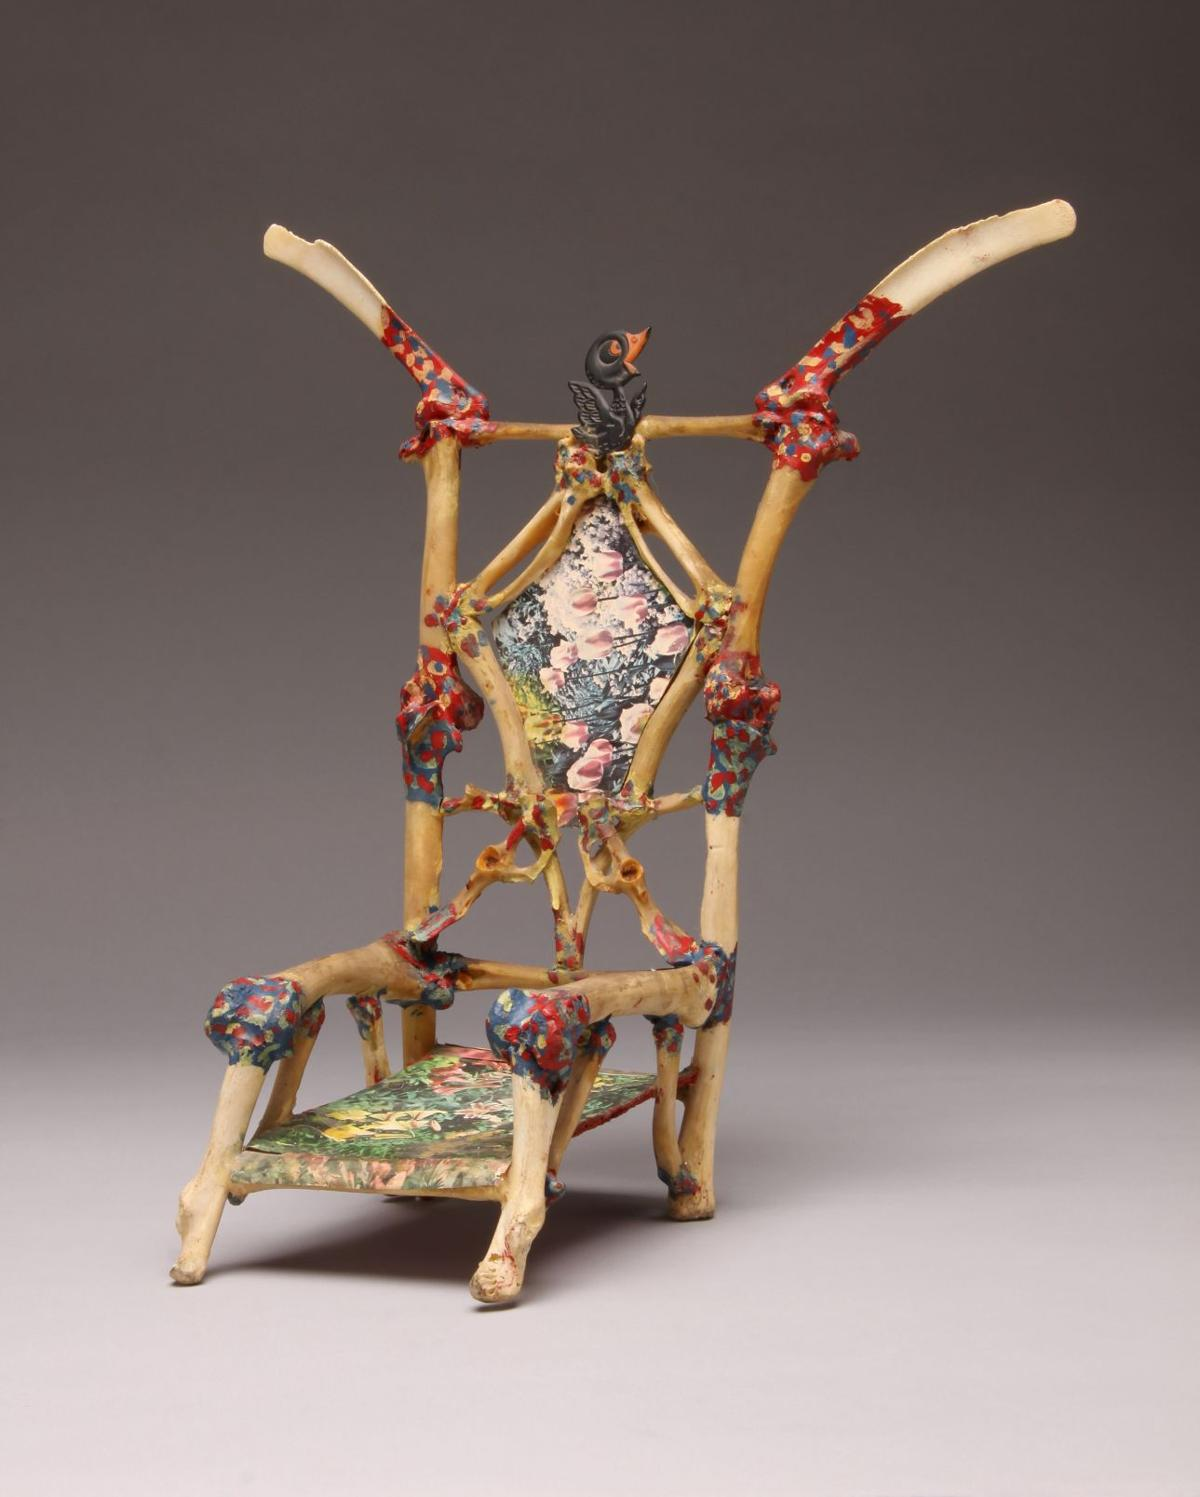 Exhibit at the Fine Arts Center celebrates American folk art